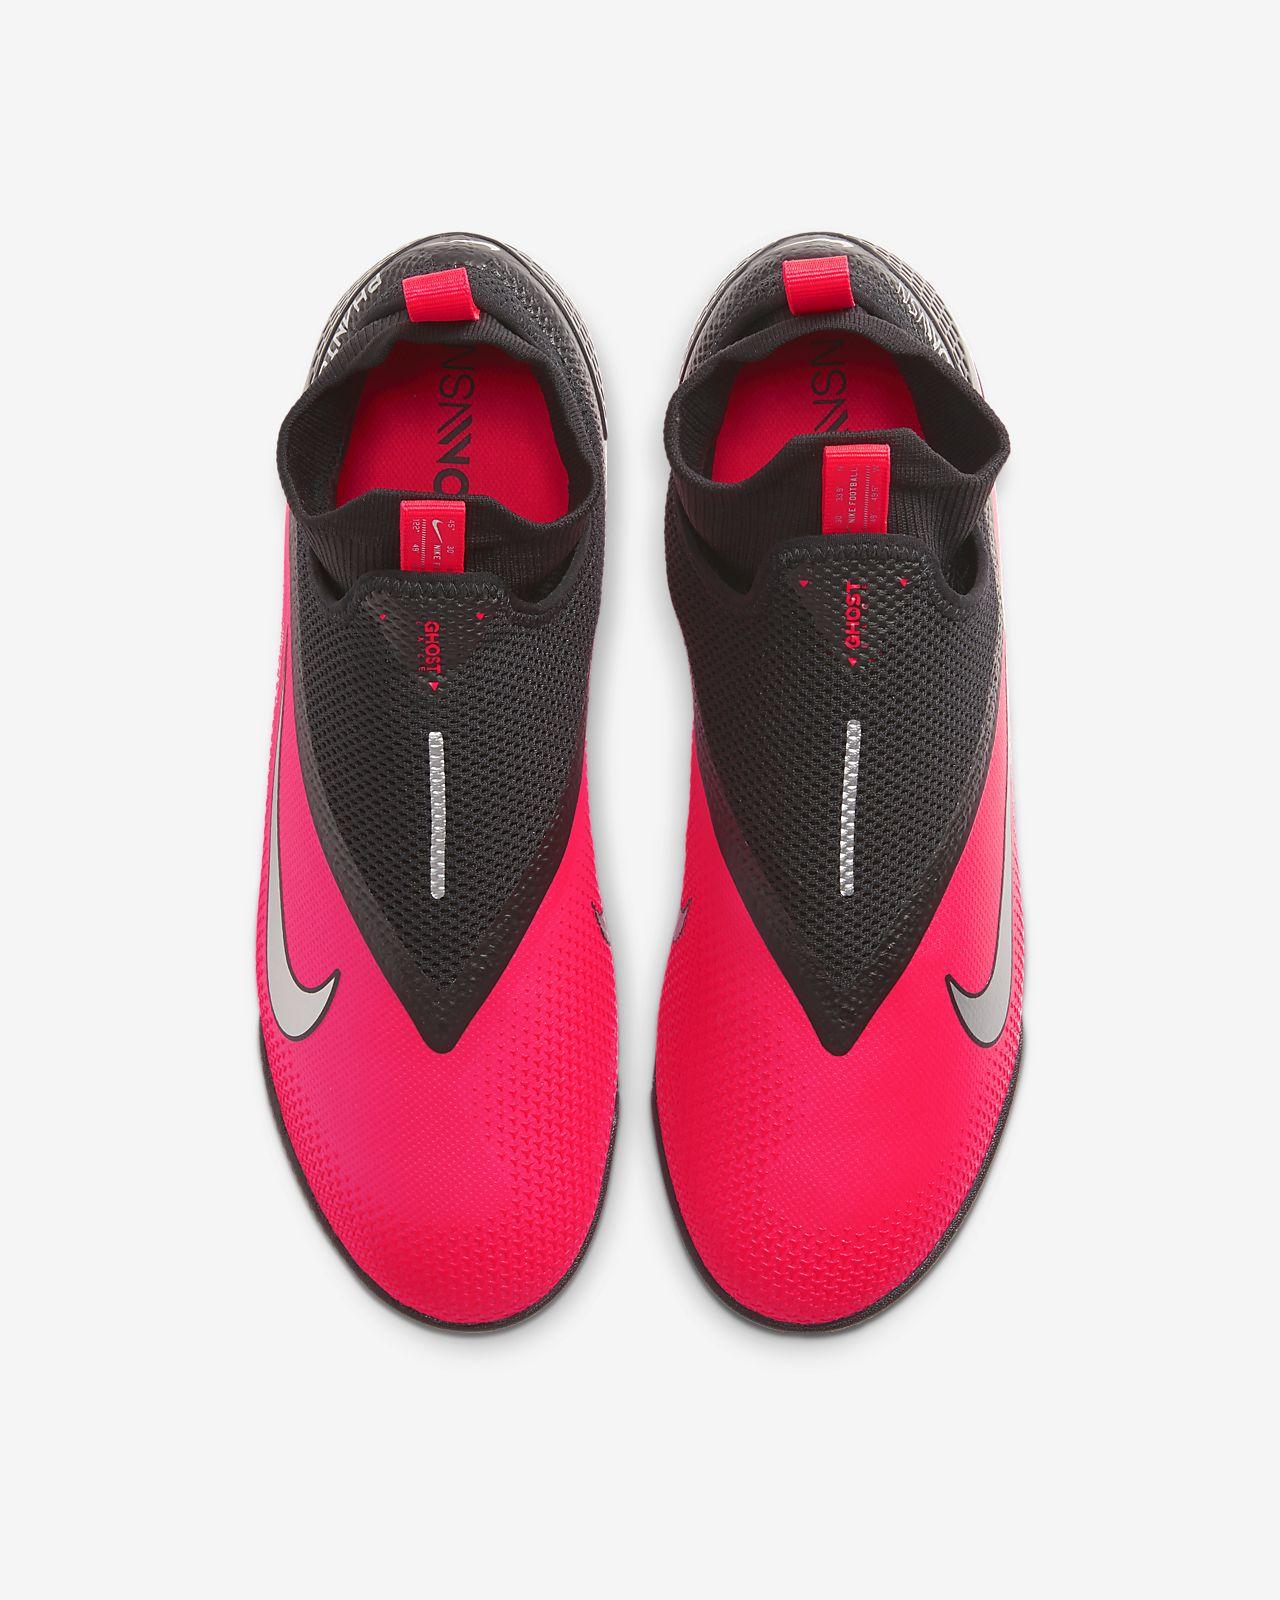 Nike React Phantom Vision 2 Pro Dynamic Fit TF Artificial Turf Football Shoe